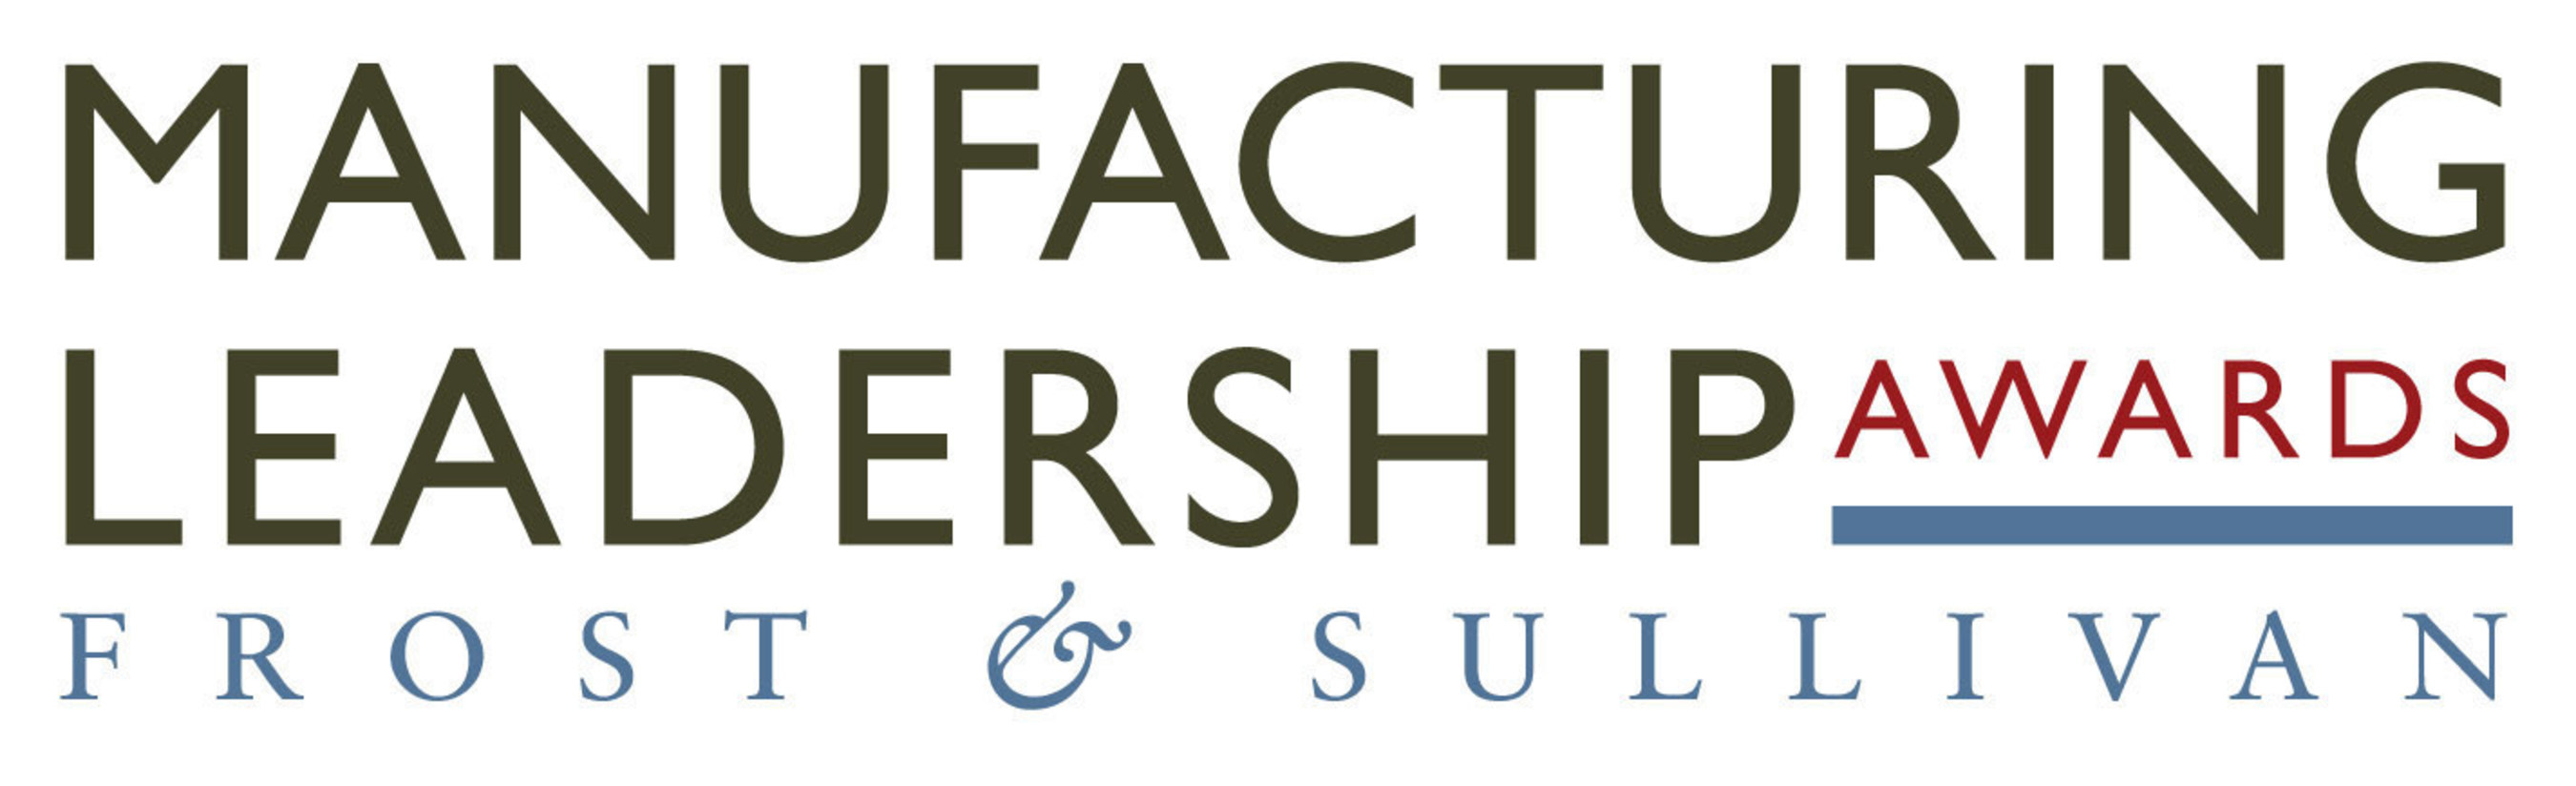 2016 Manufacturing Leadership Award Winners Announced